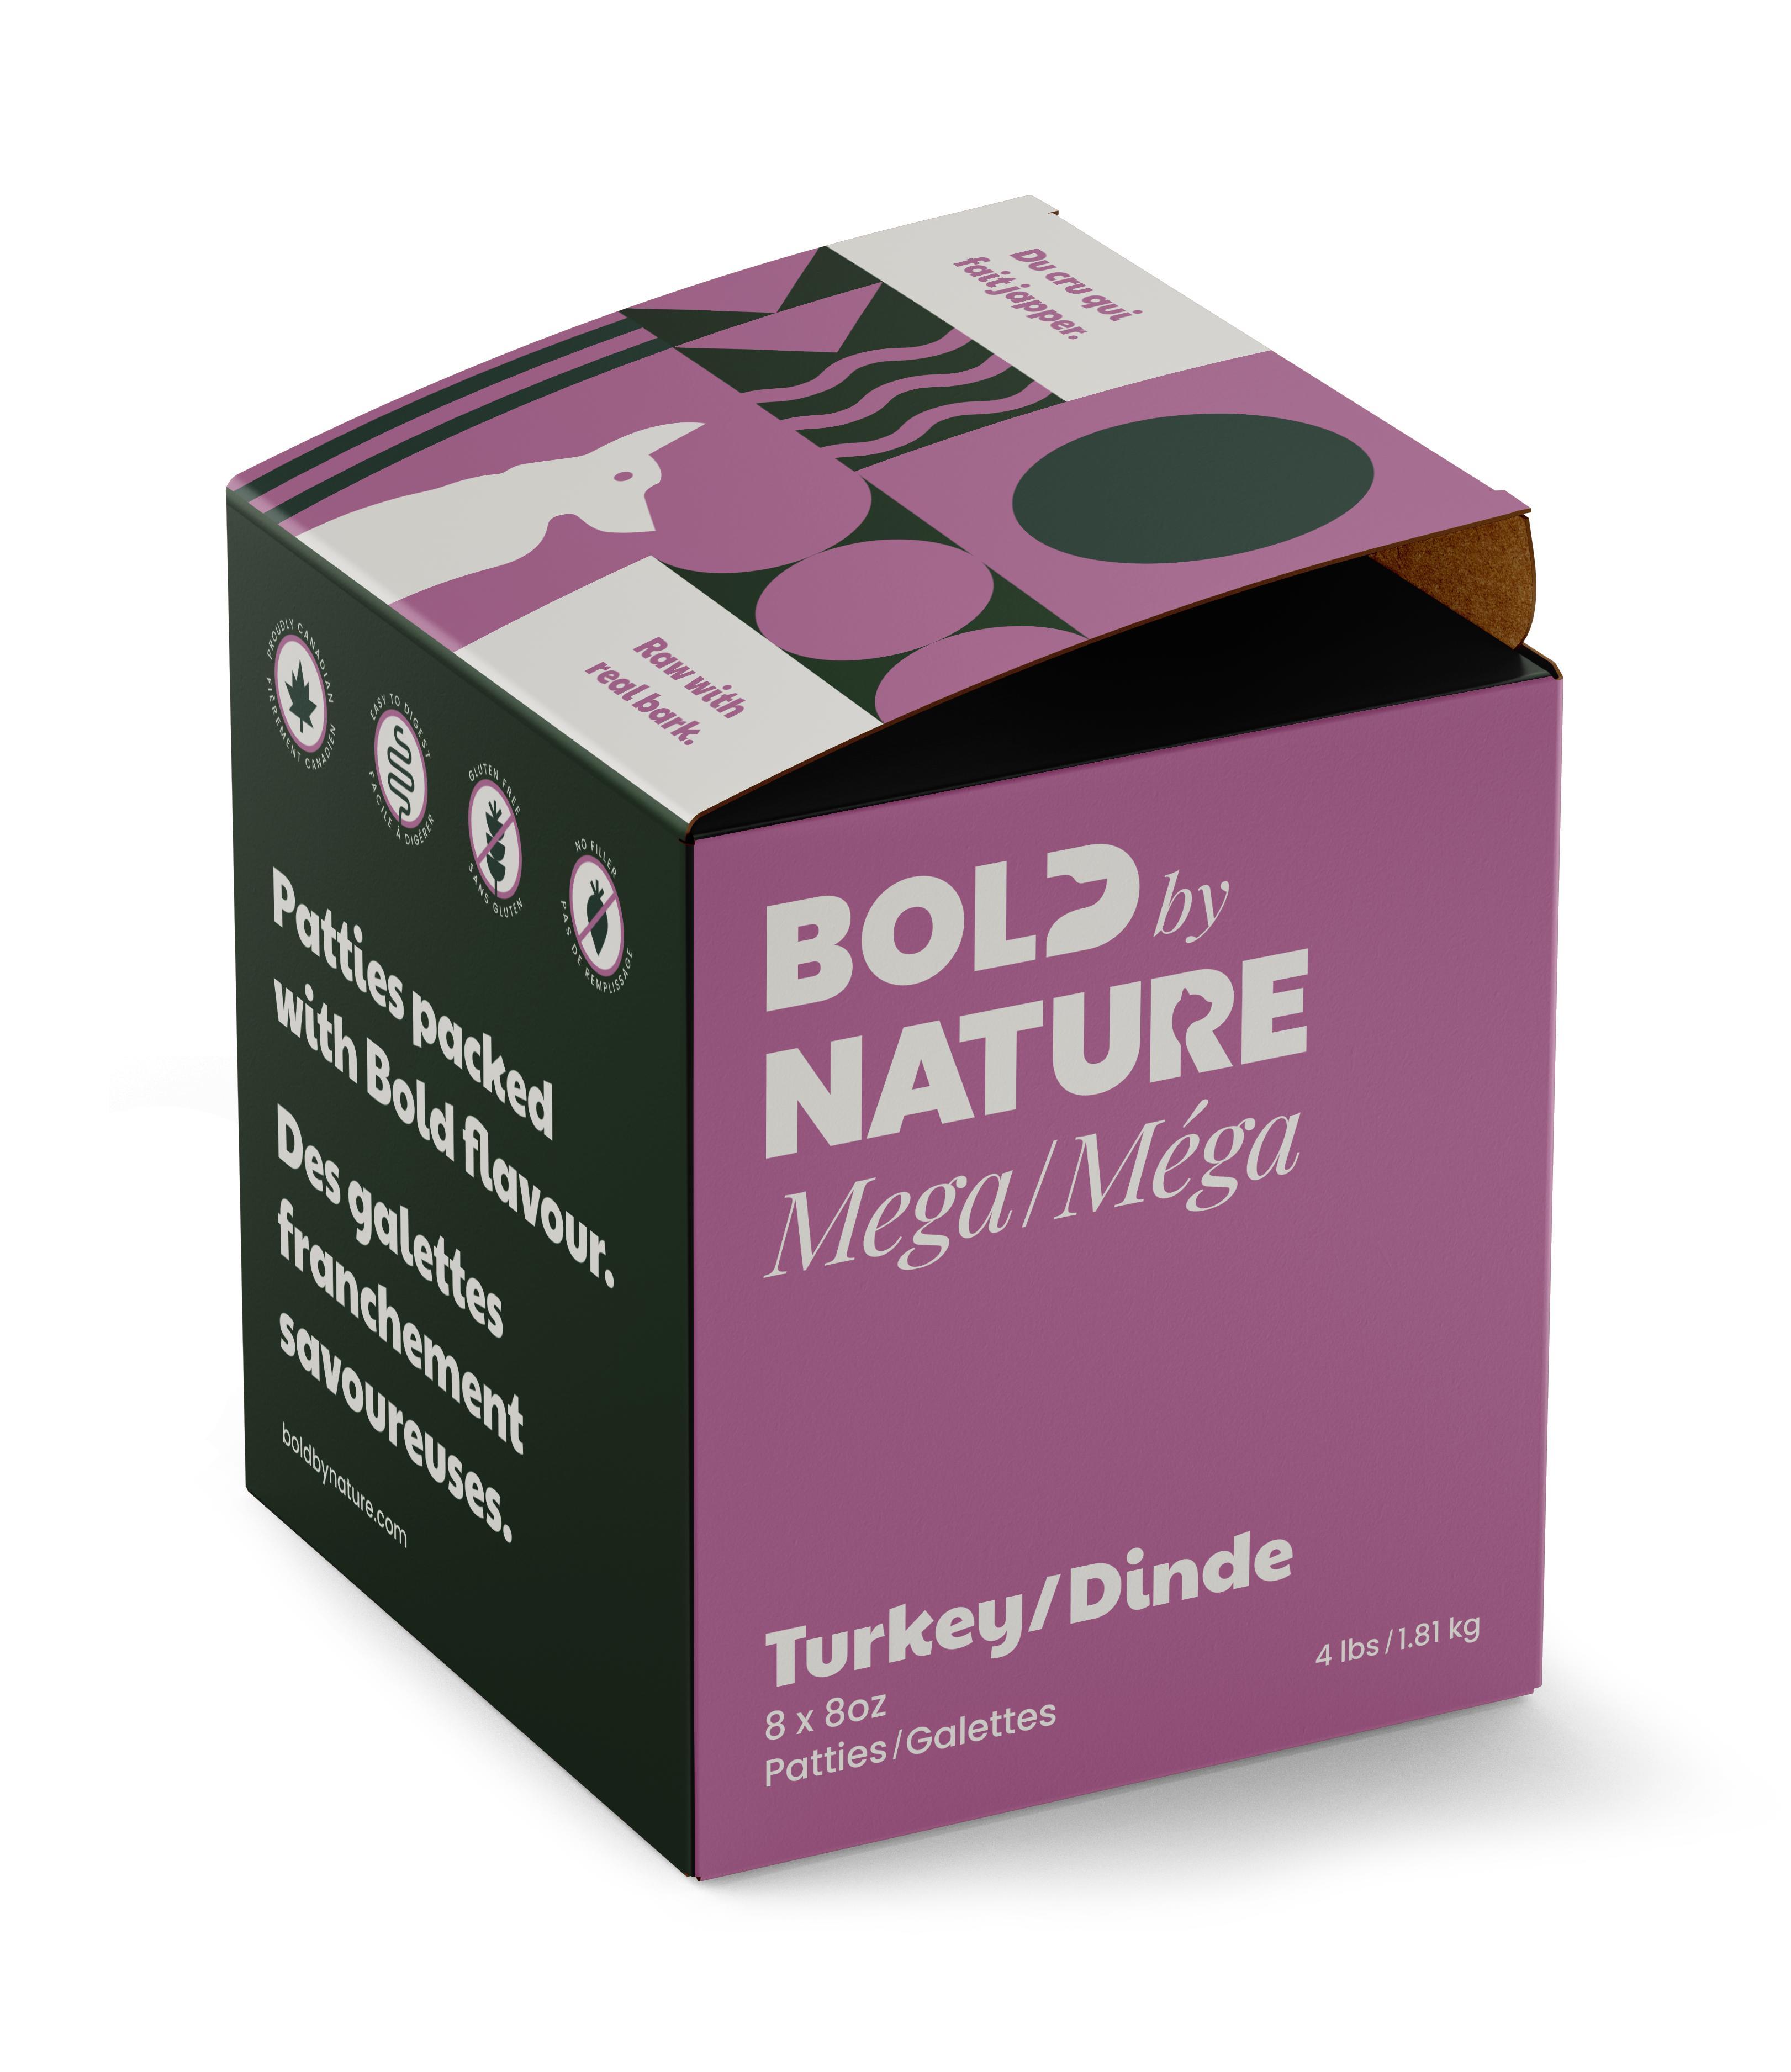 Bold by Nature Dog Mega Turkey Patties, 4-lb